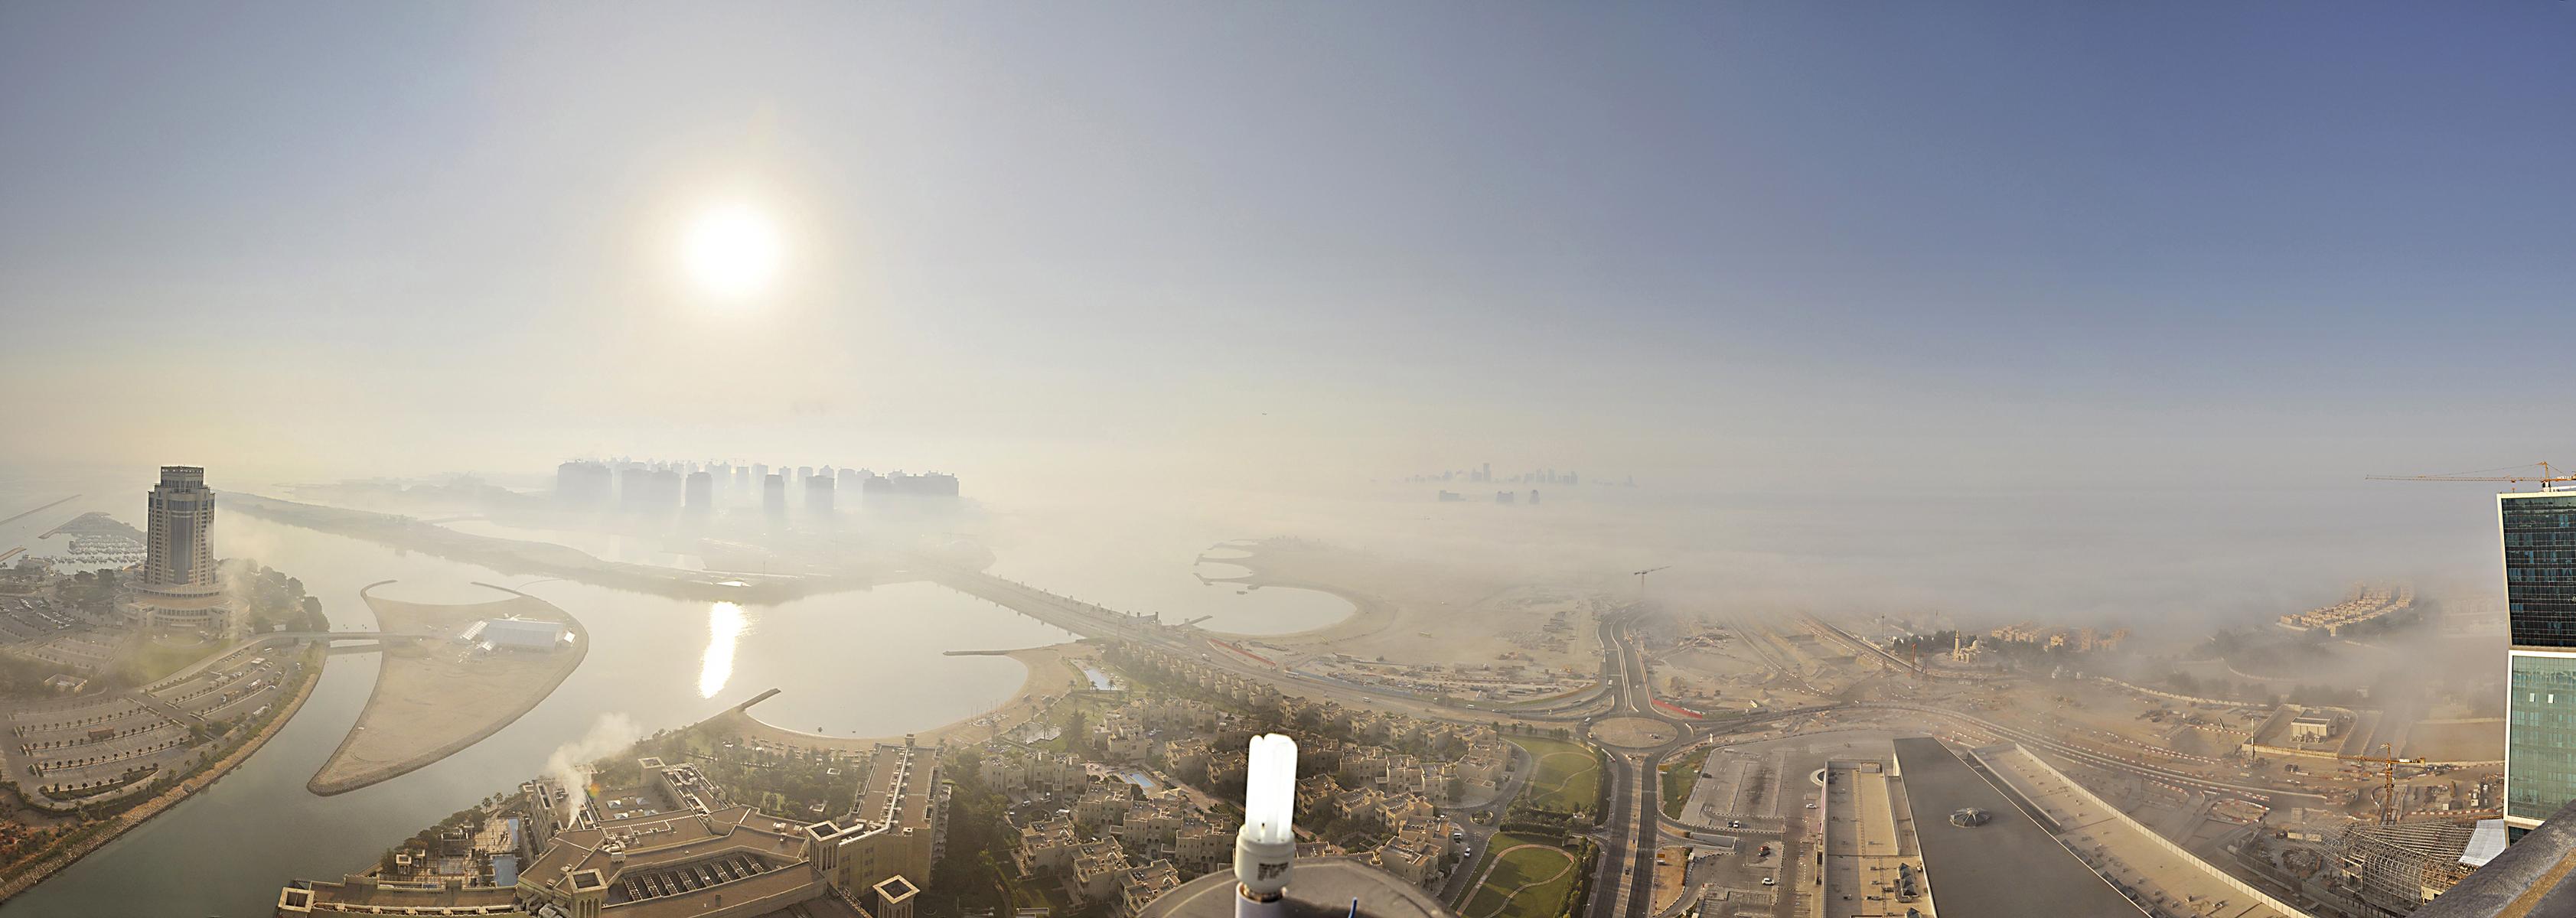 01 aerial doha zig zag mist post